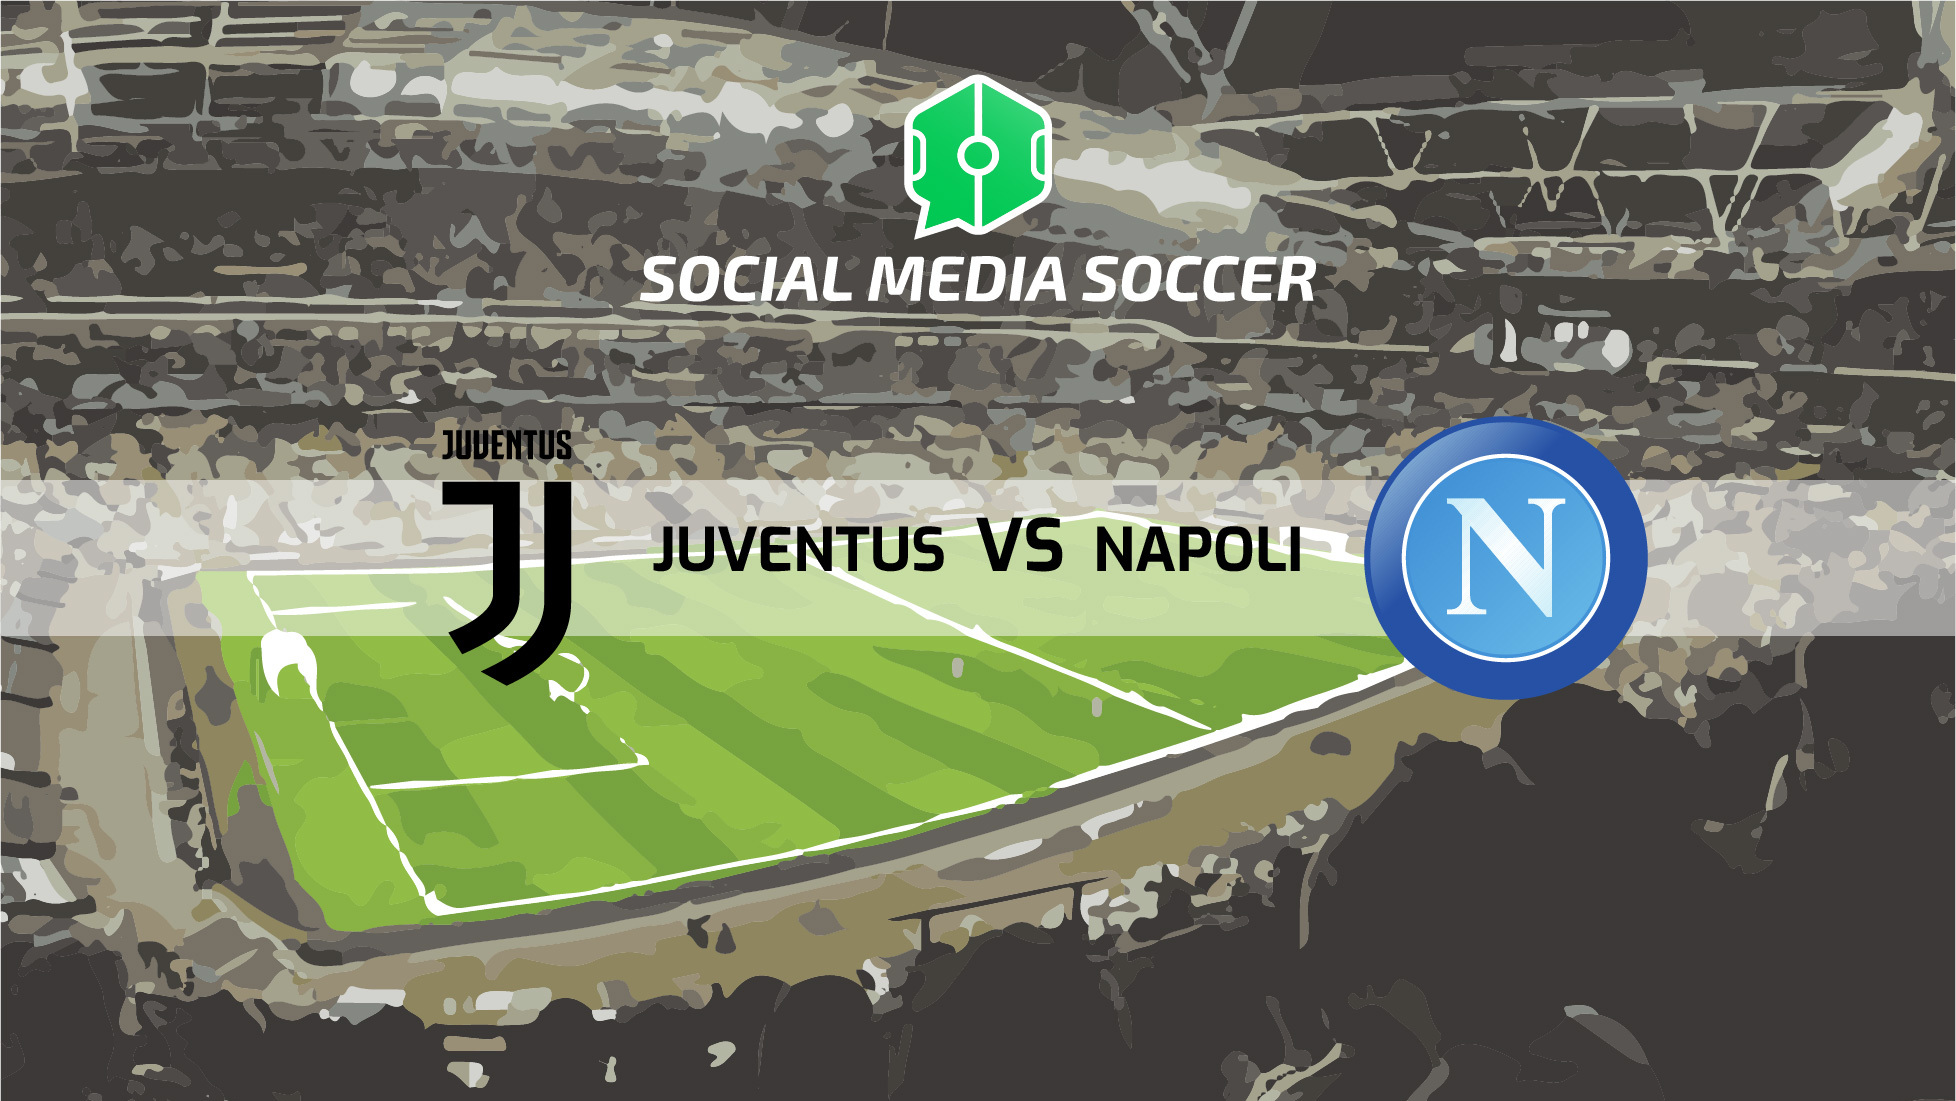 Juventus-Napoli Social